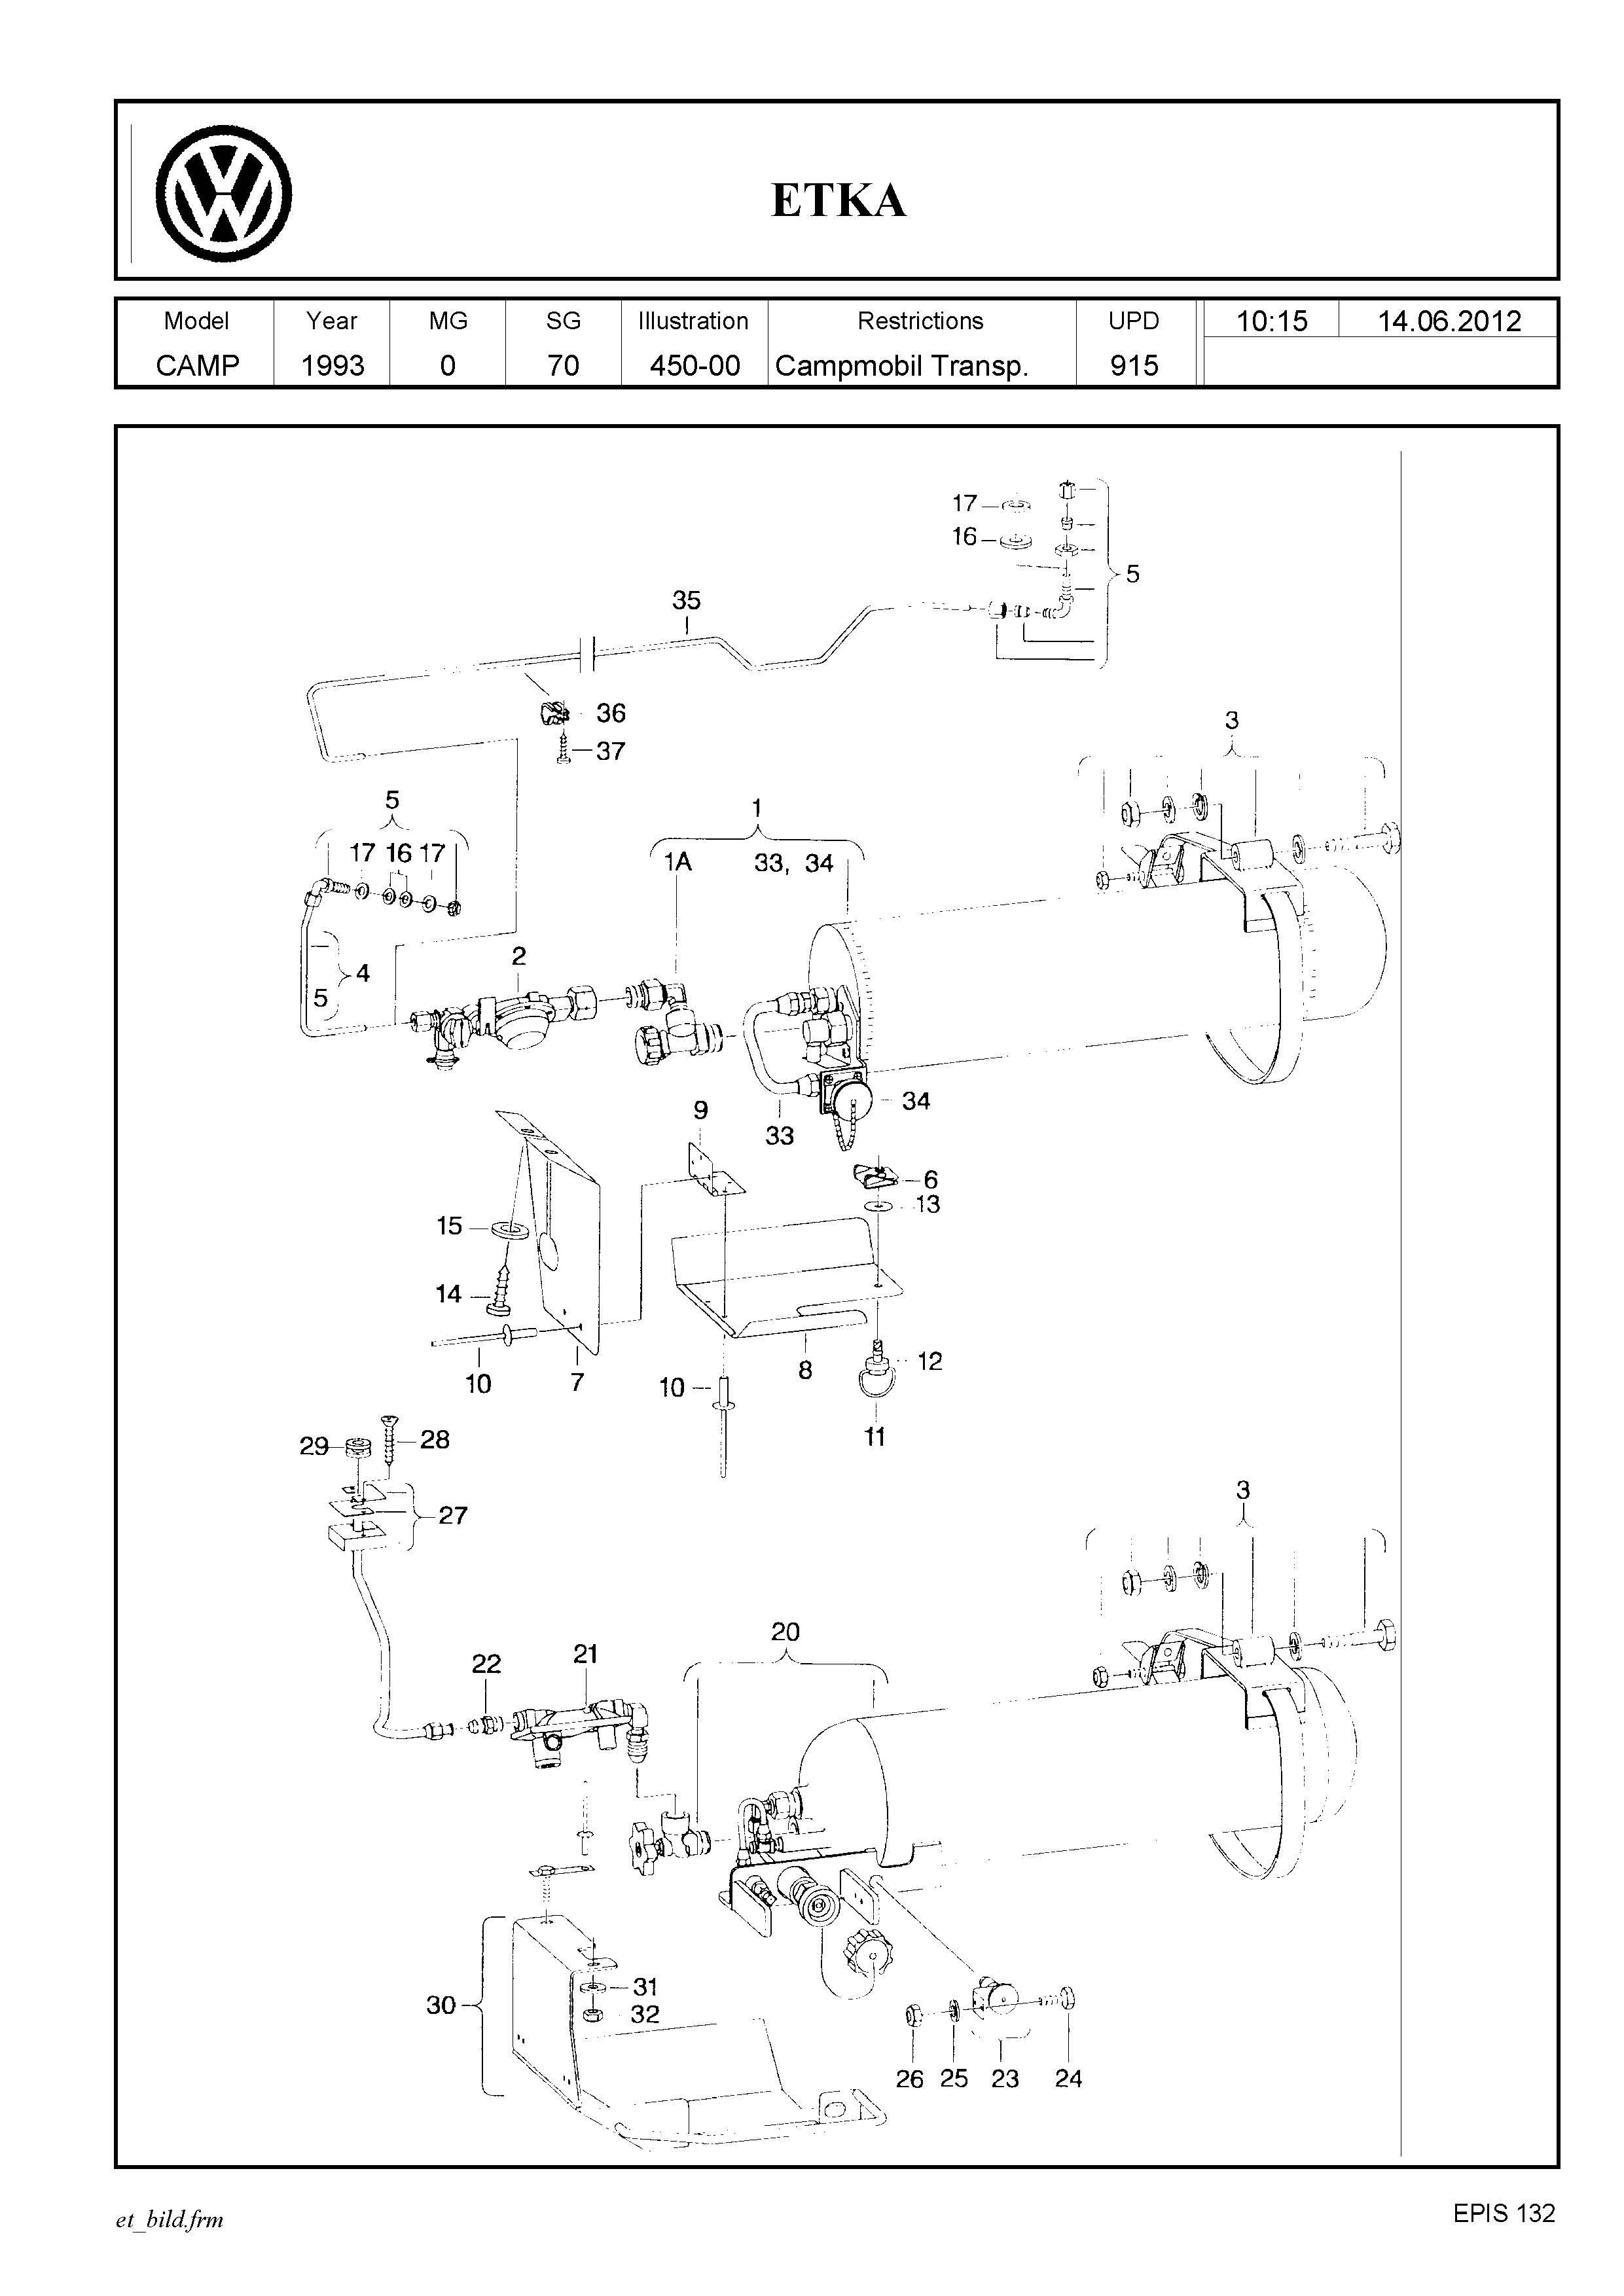 Propane Tank Drawing At Getdrawings Com Free For